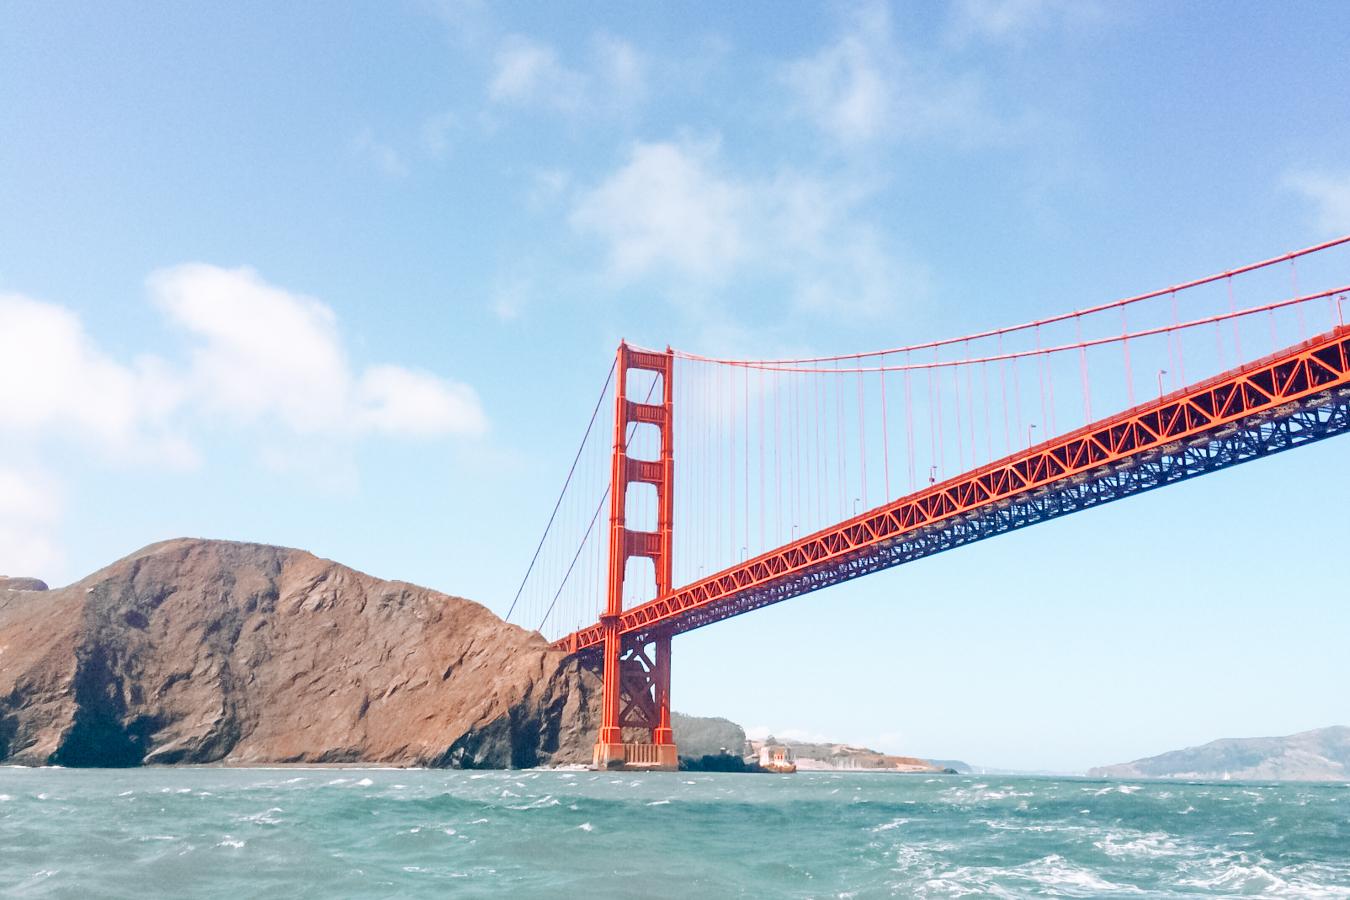 Golden Gate Bay